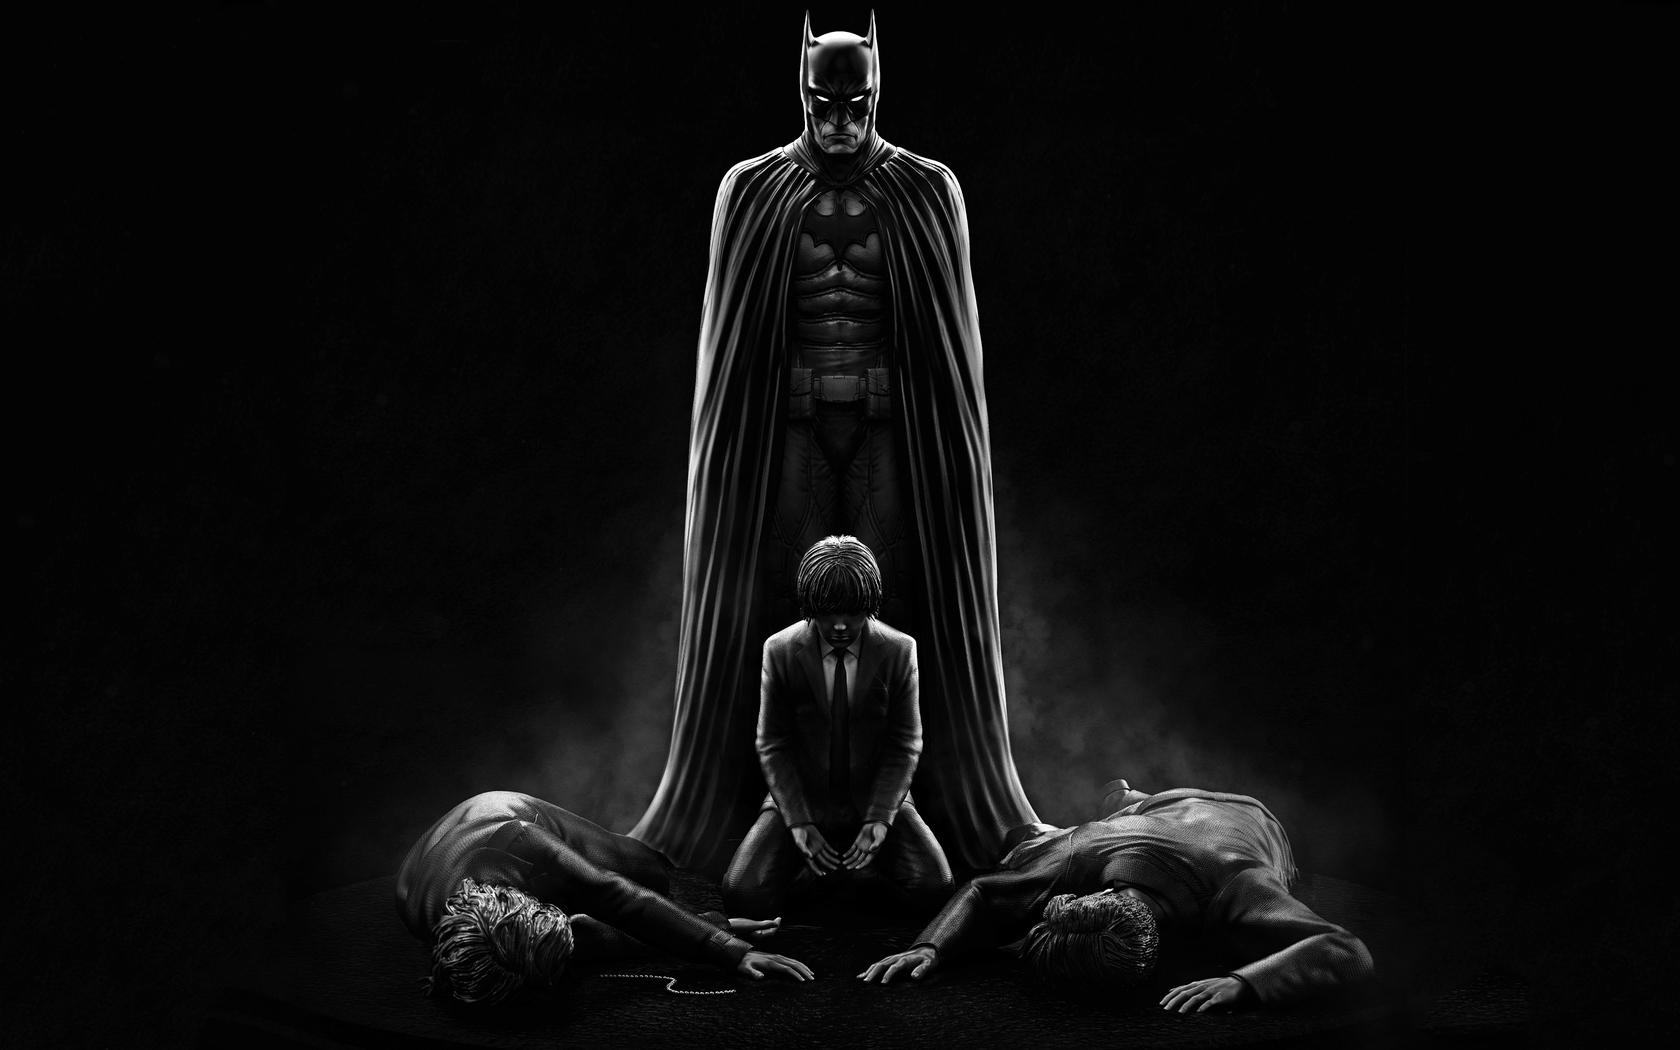 1680x1050 Batman Parents Death 4k 1680x1050 Resolution Hd 4k Wallpapers Images Backgrounds Photos And Pictures